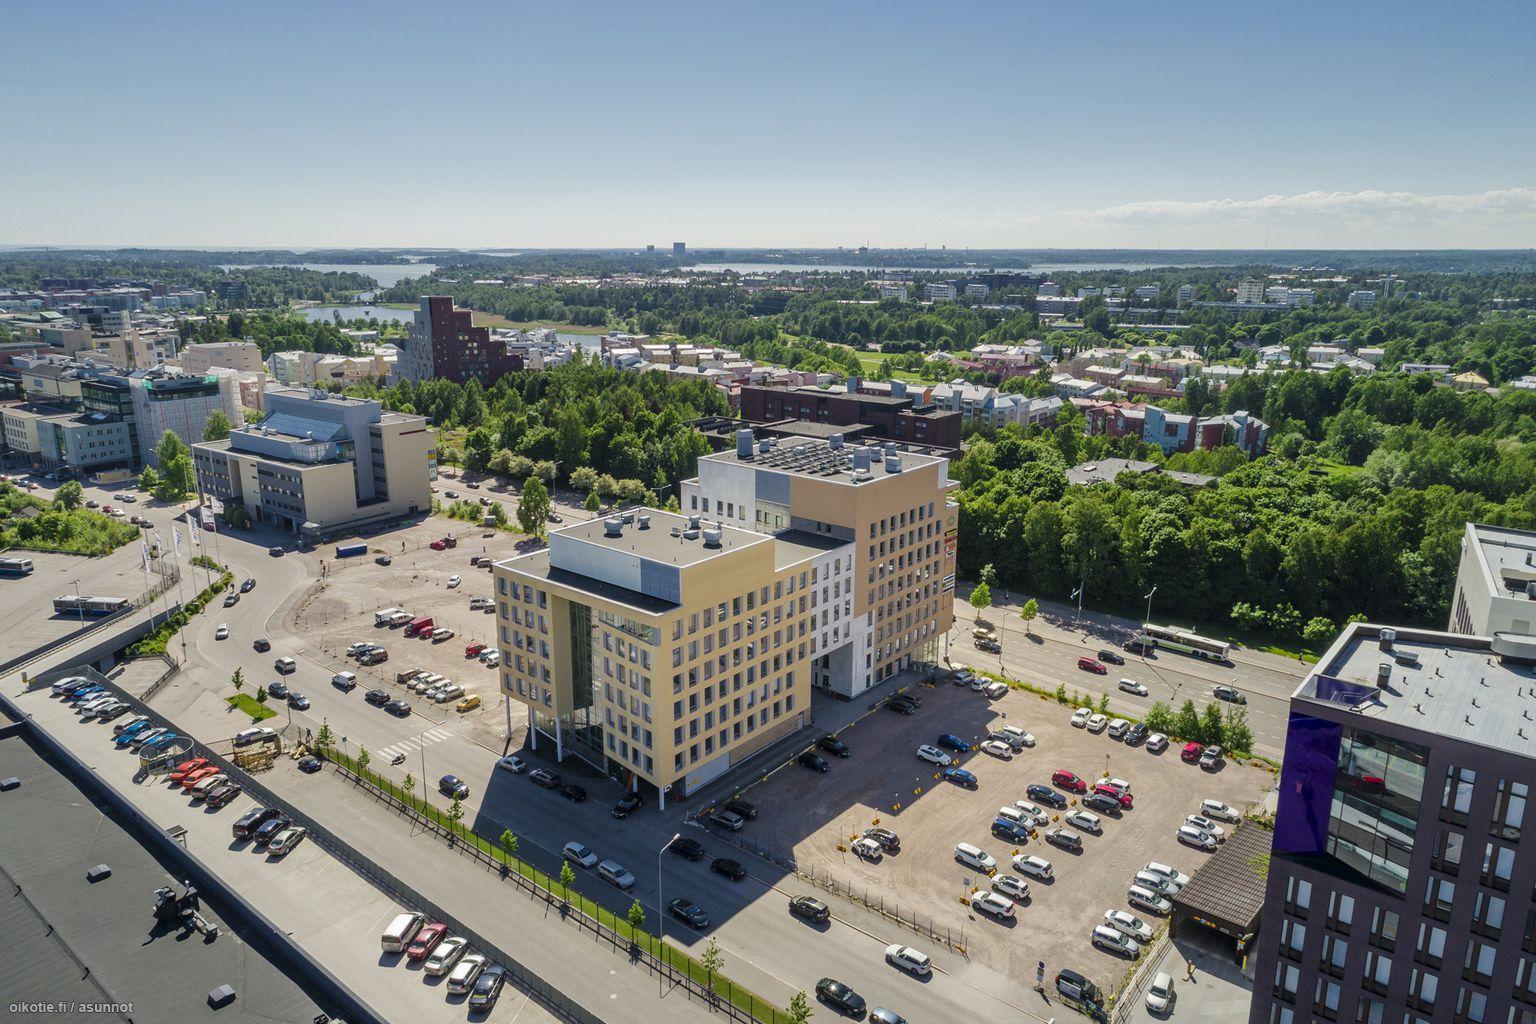 00250 Finland